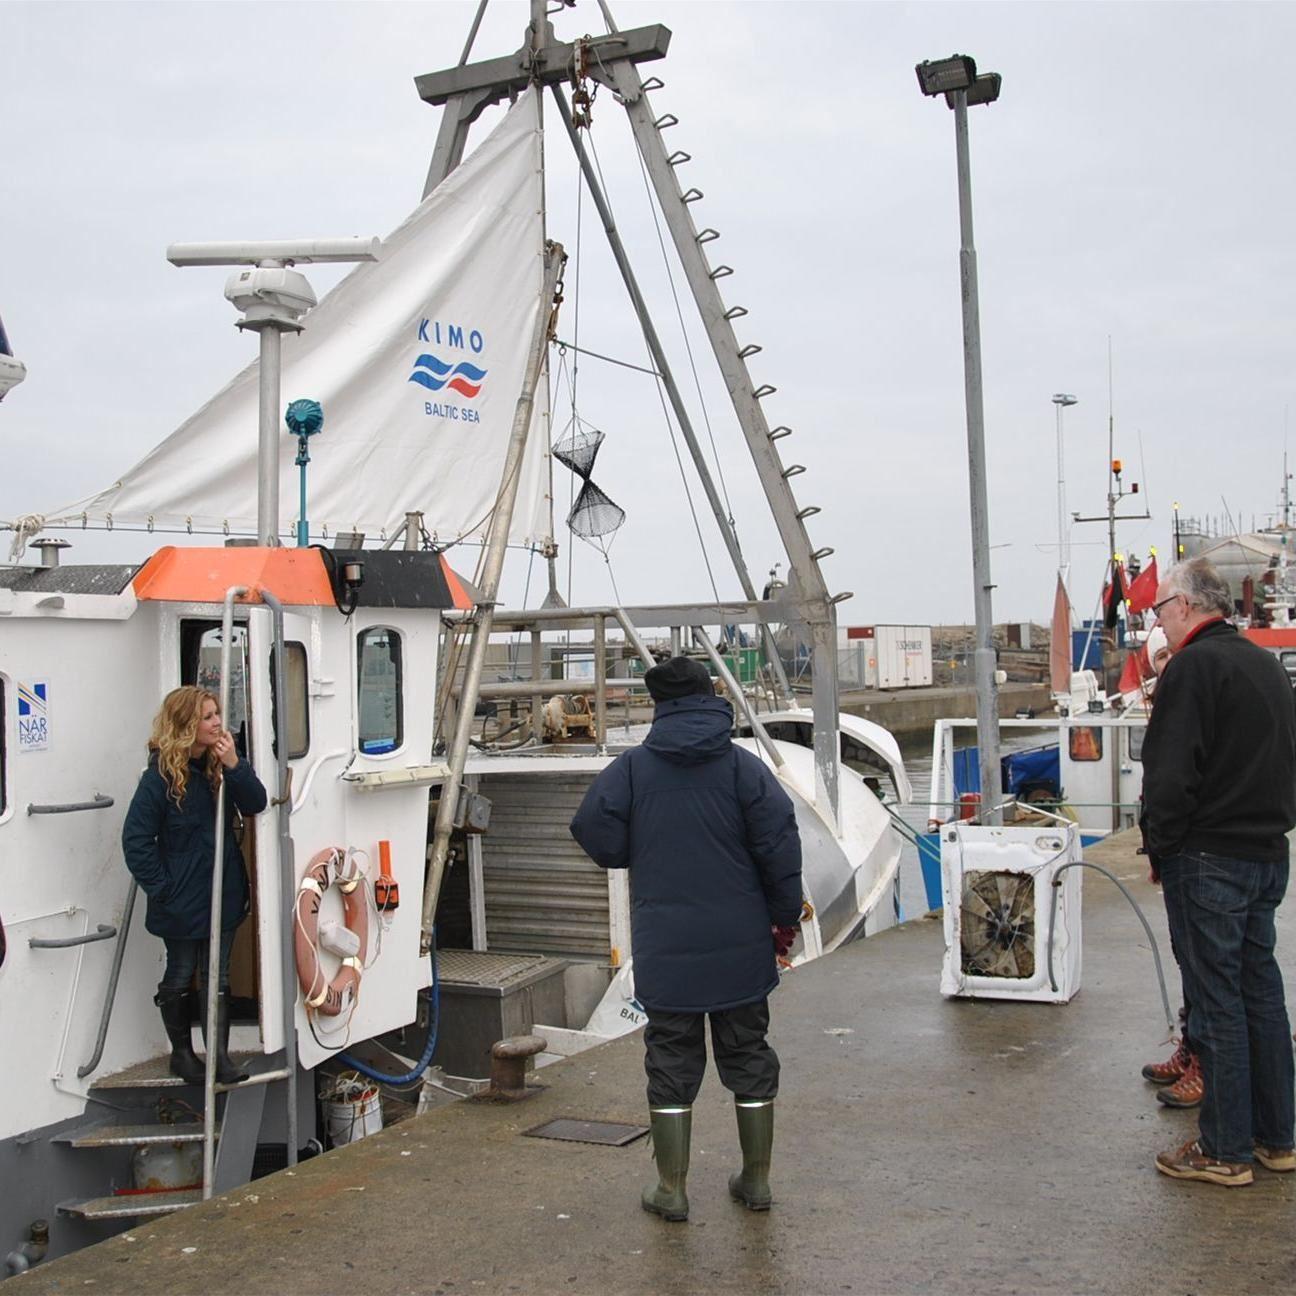 Fiskeri med lokale fiskere